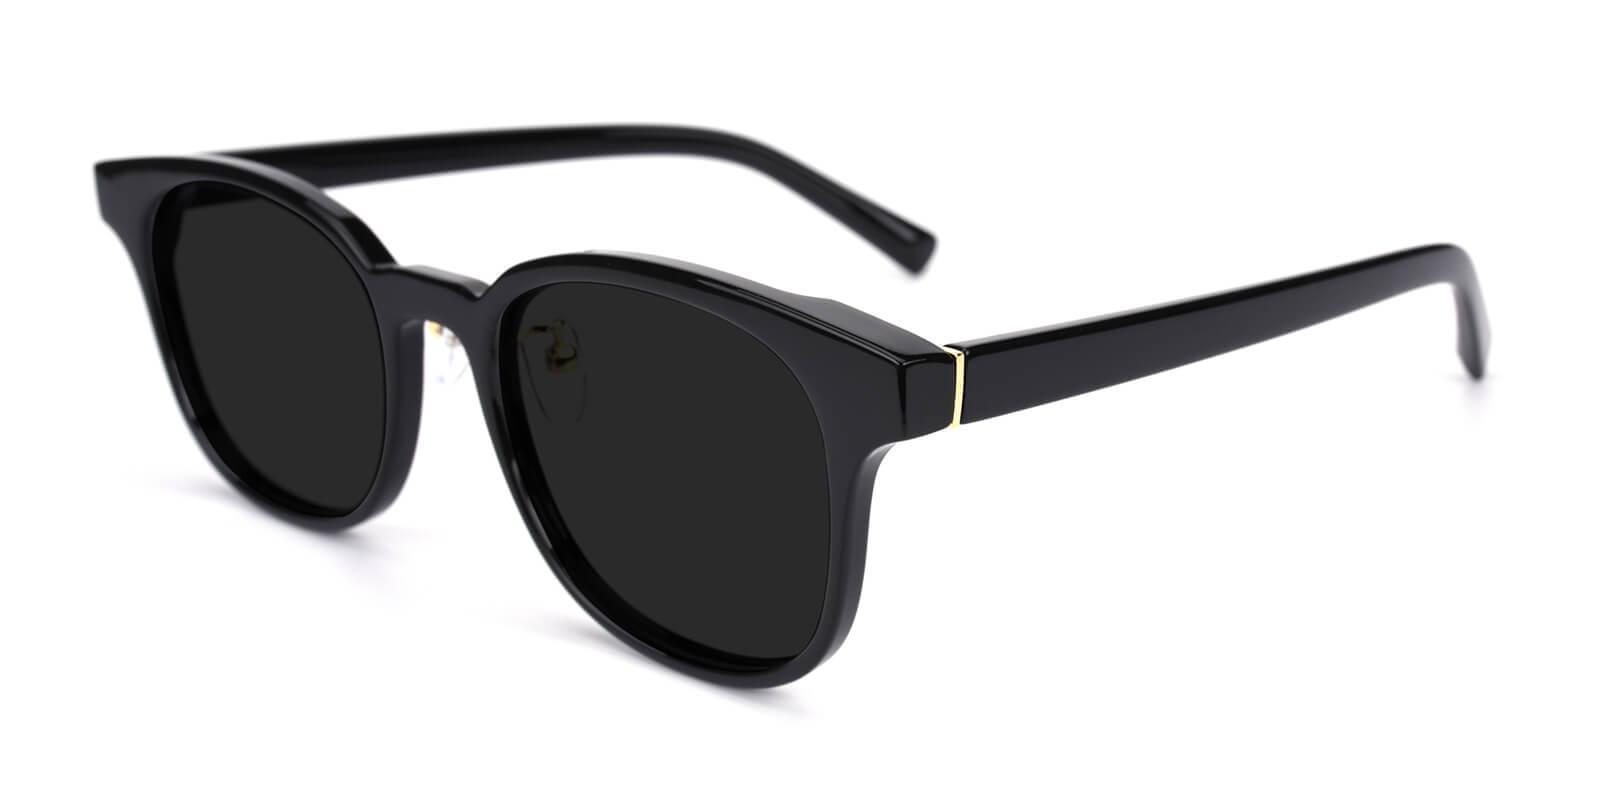 Soyok-Black-Square / Cat-TR-Sunglasses-additional1